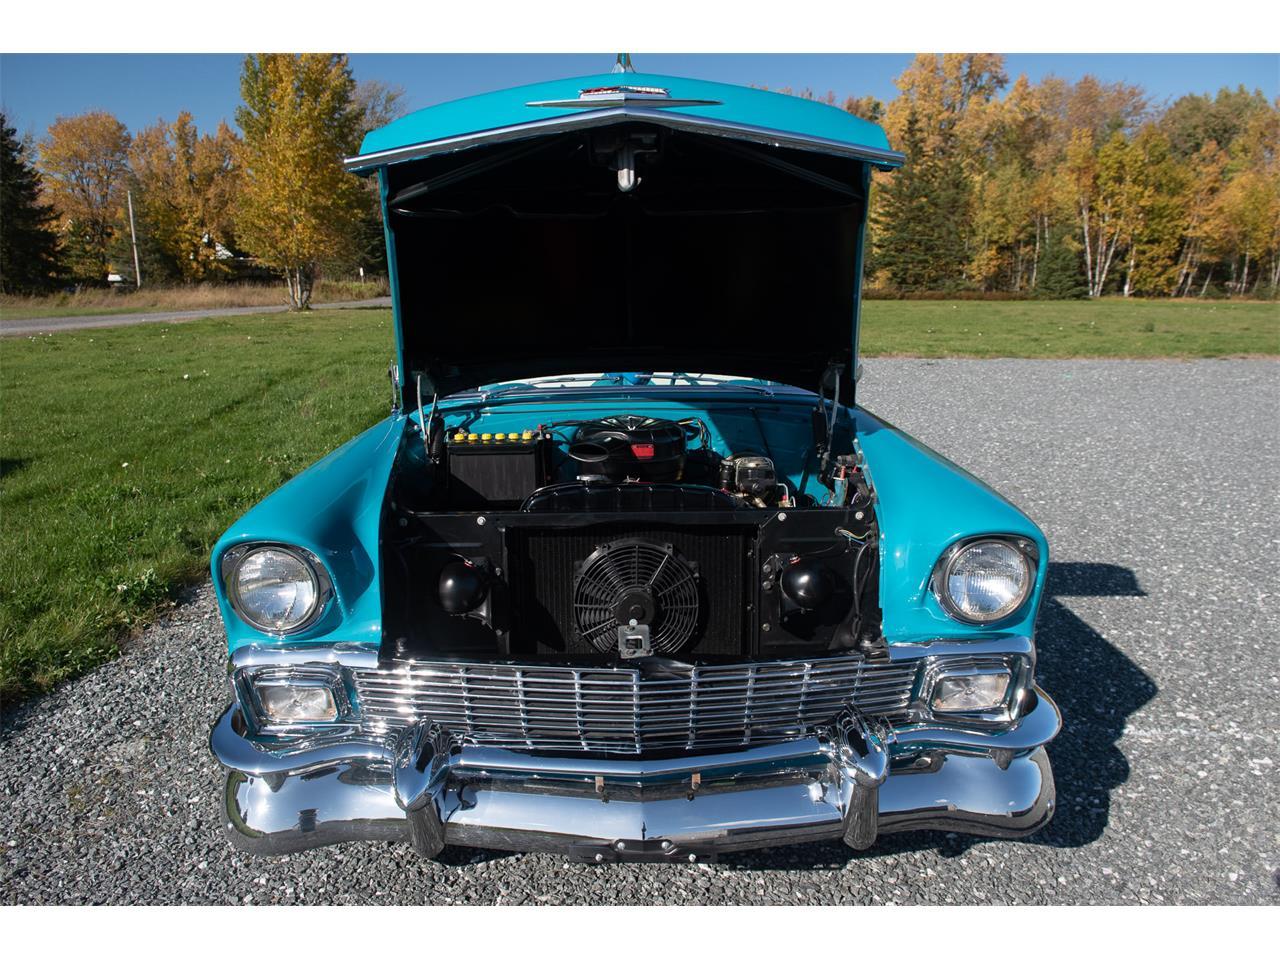 1956 Chevrolet Bel Air (CC-1275004) for sale in SUDBURY, Ontario